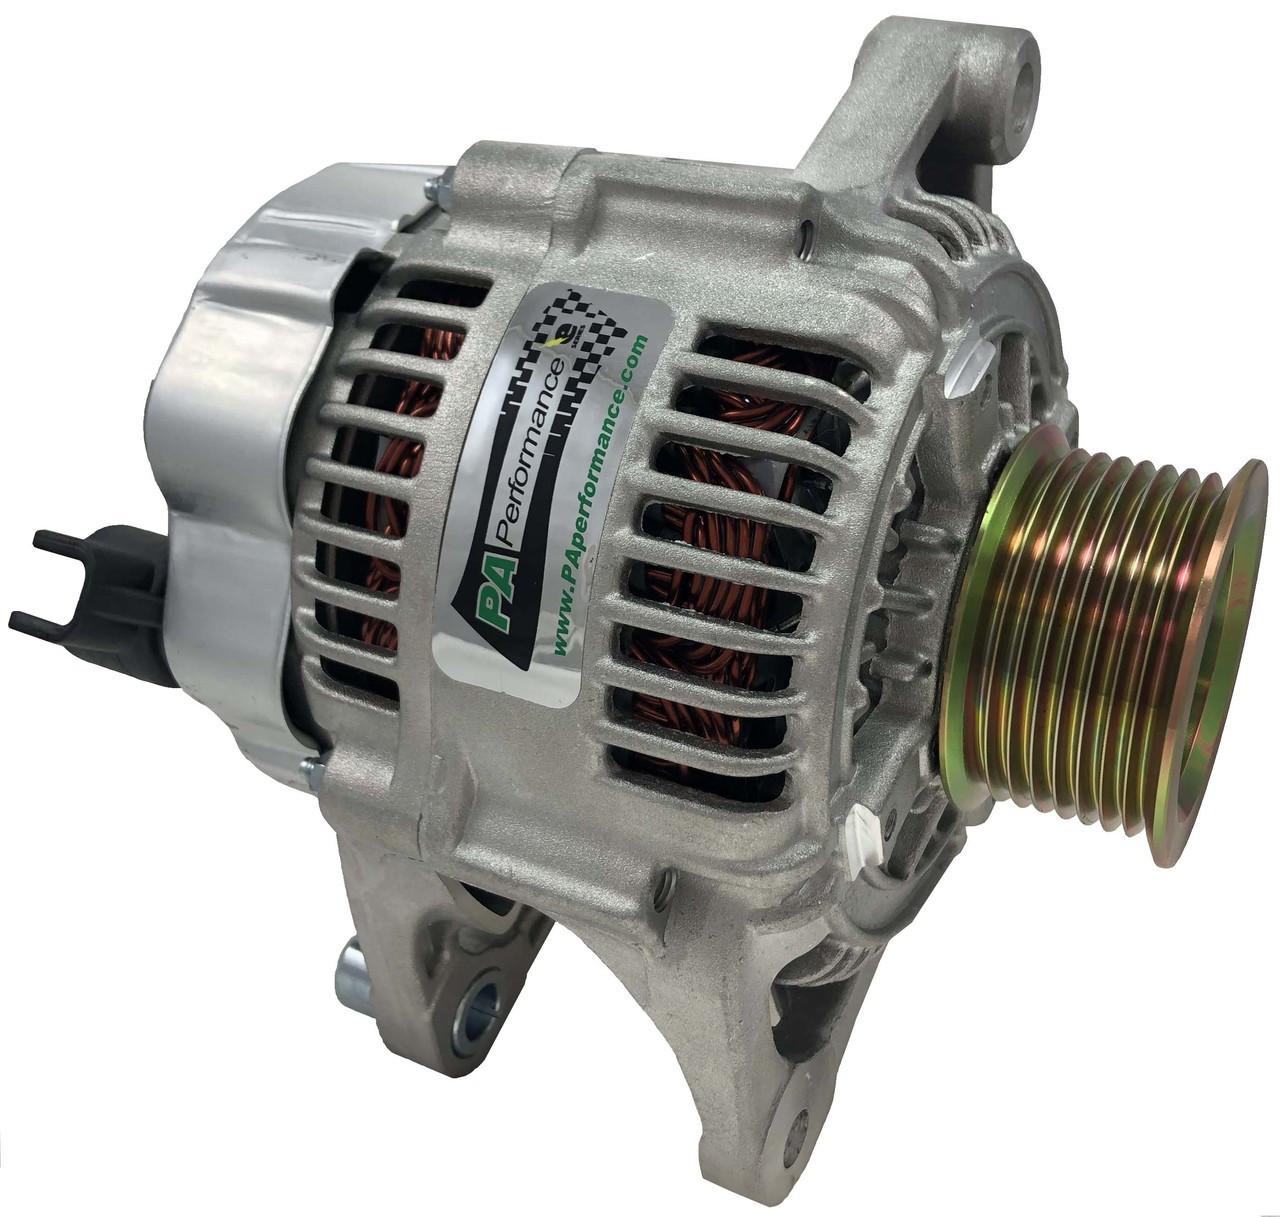 136a denso alternator 5 9 cummins 1 wire89 Dodge W250 Wiring Alternator And Regulator #13